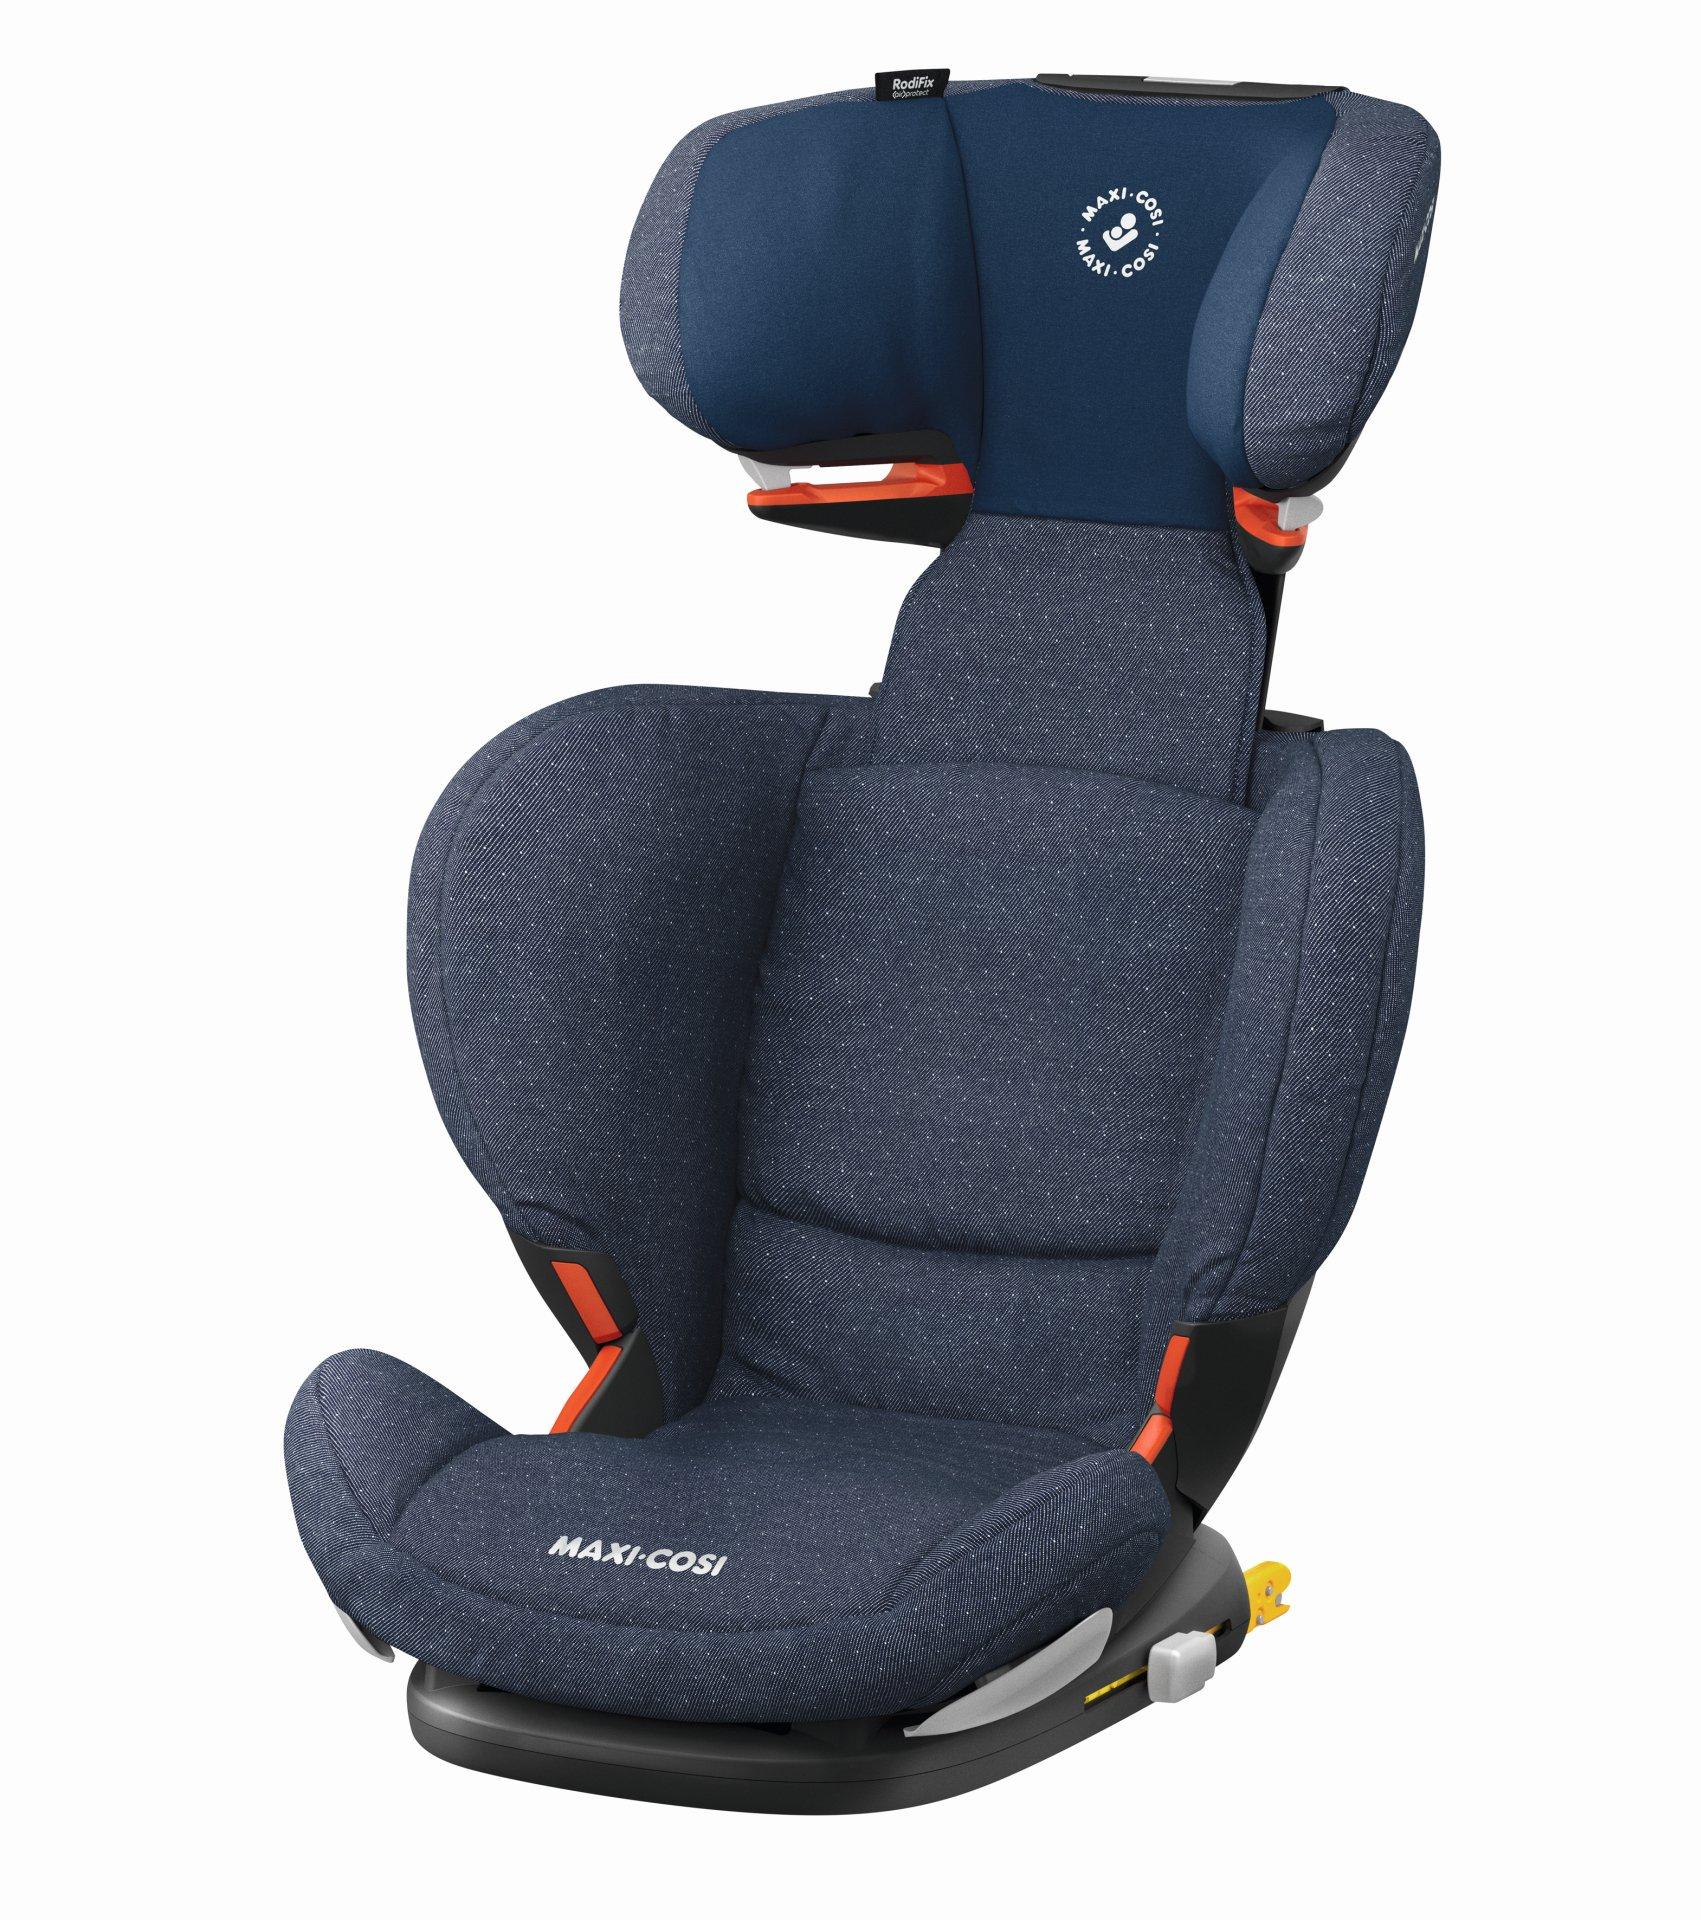 Maxi Cosi Airprotect : maxi cosi child car seat rodifix airprotect 2019 sparkling blue buy at kidsroom car seats ~ Watch28wear.com Haus und Dekorationen